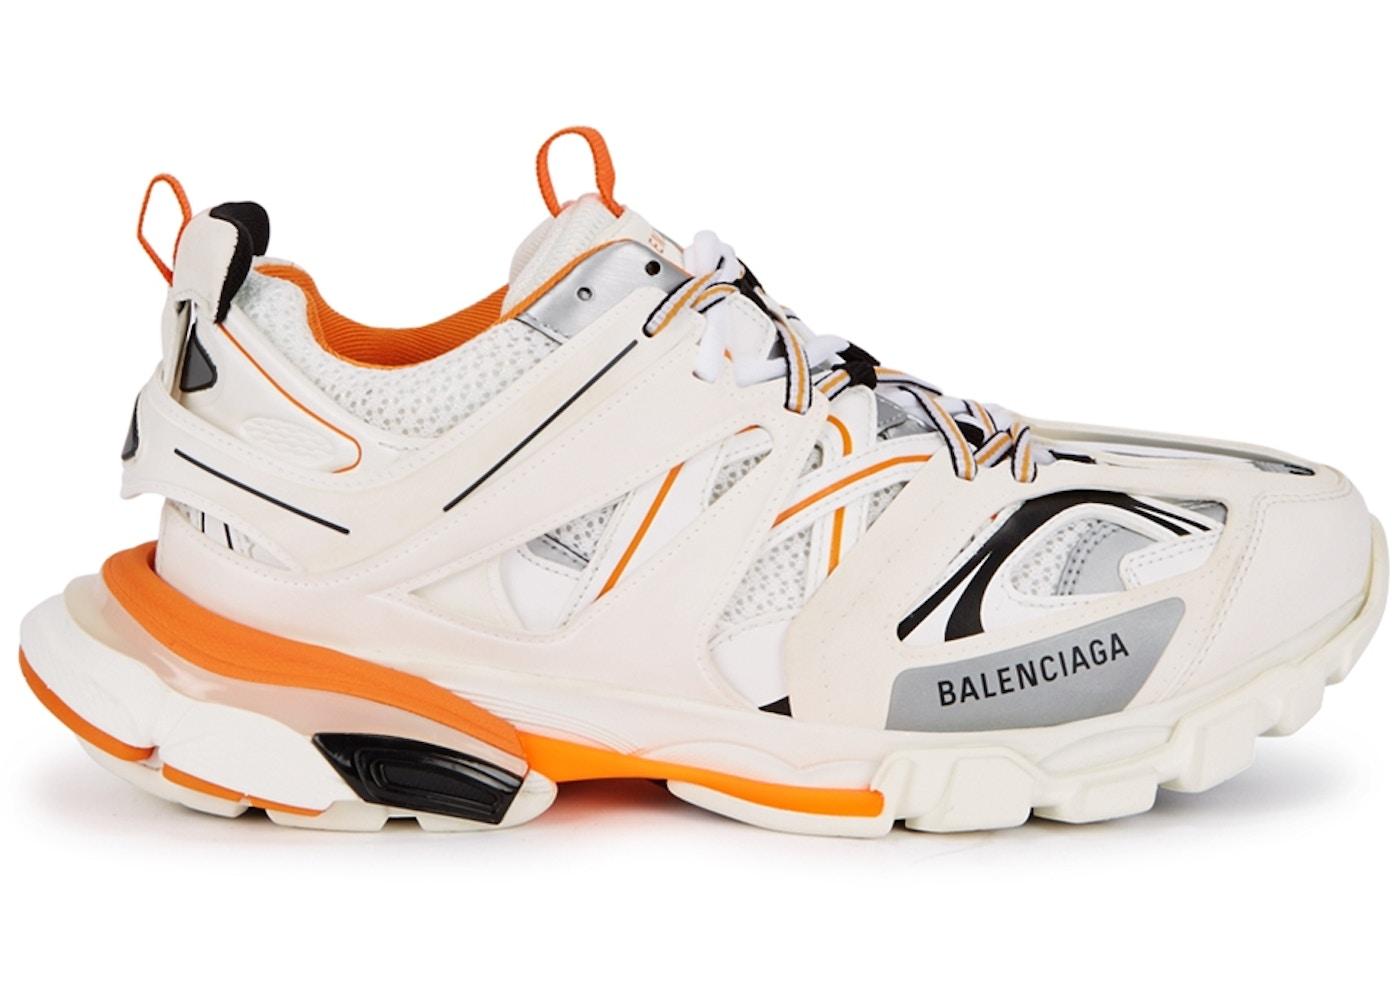 Balenciaga Track White Orange 542023w1gb19059